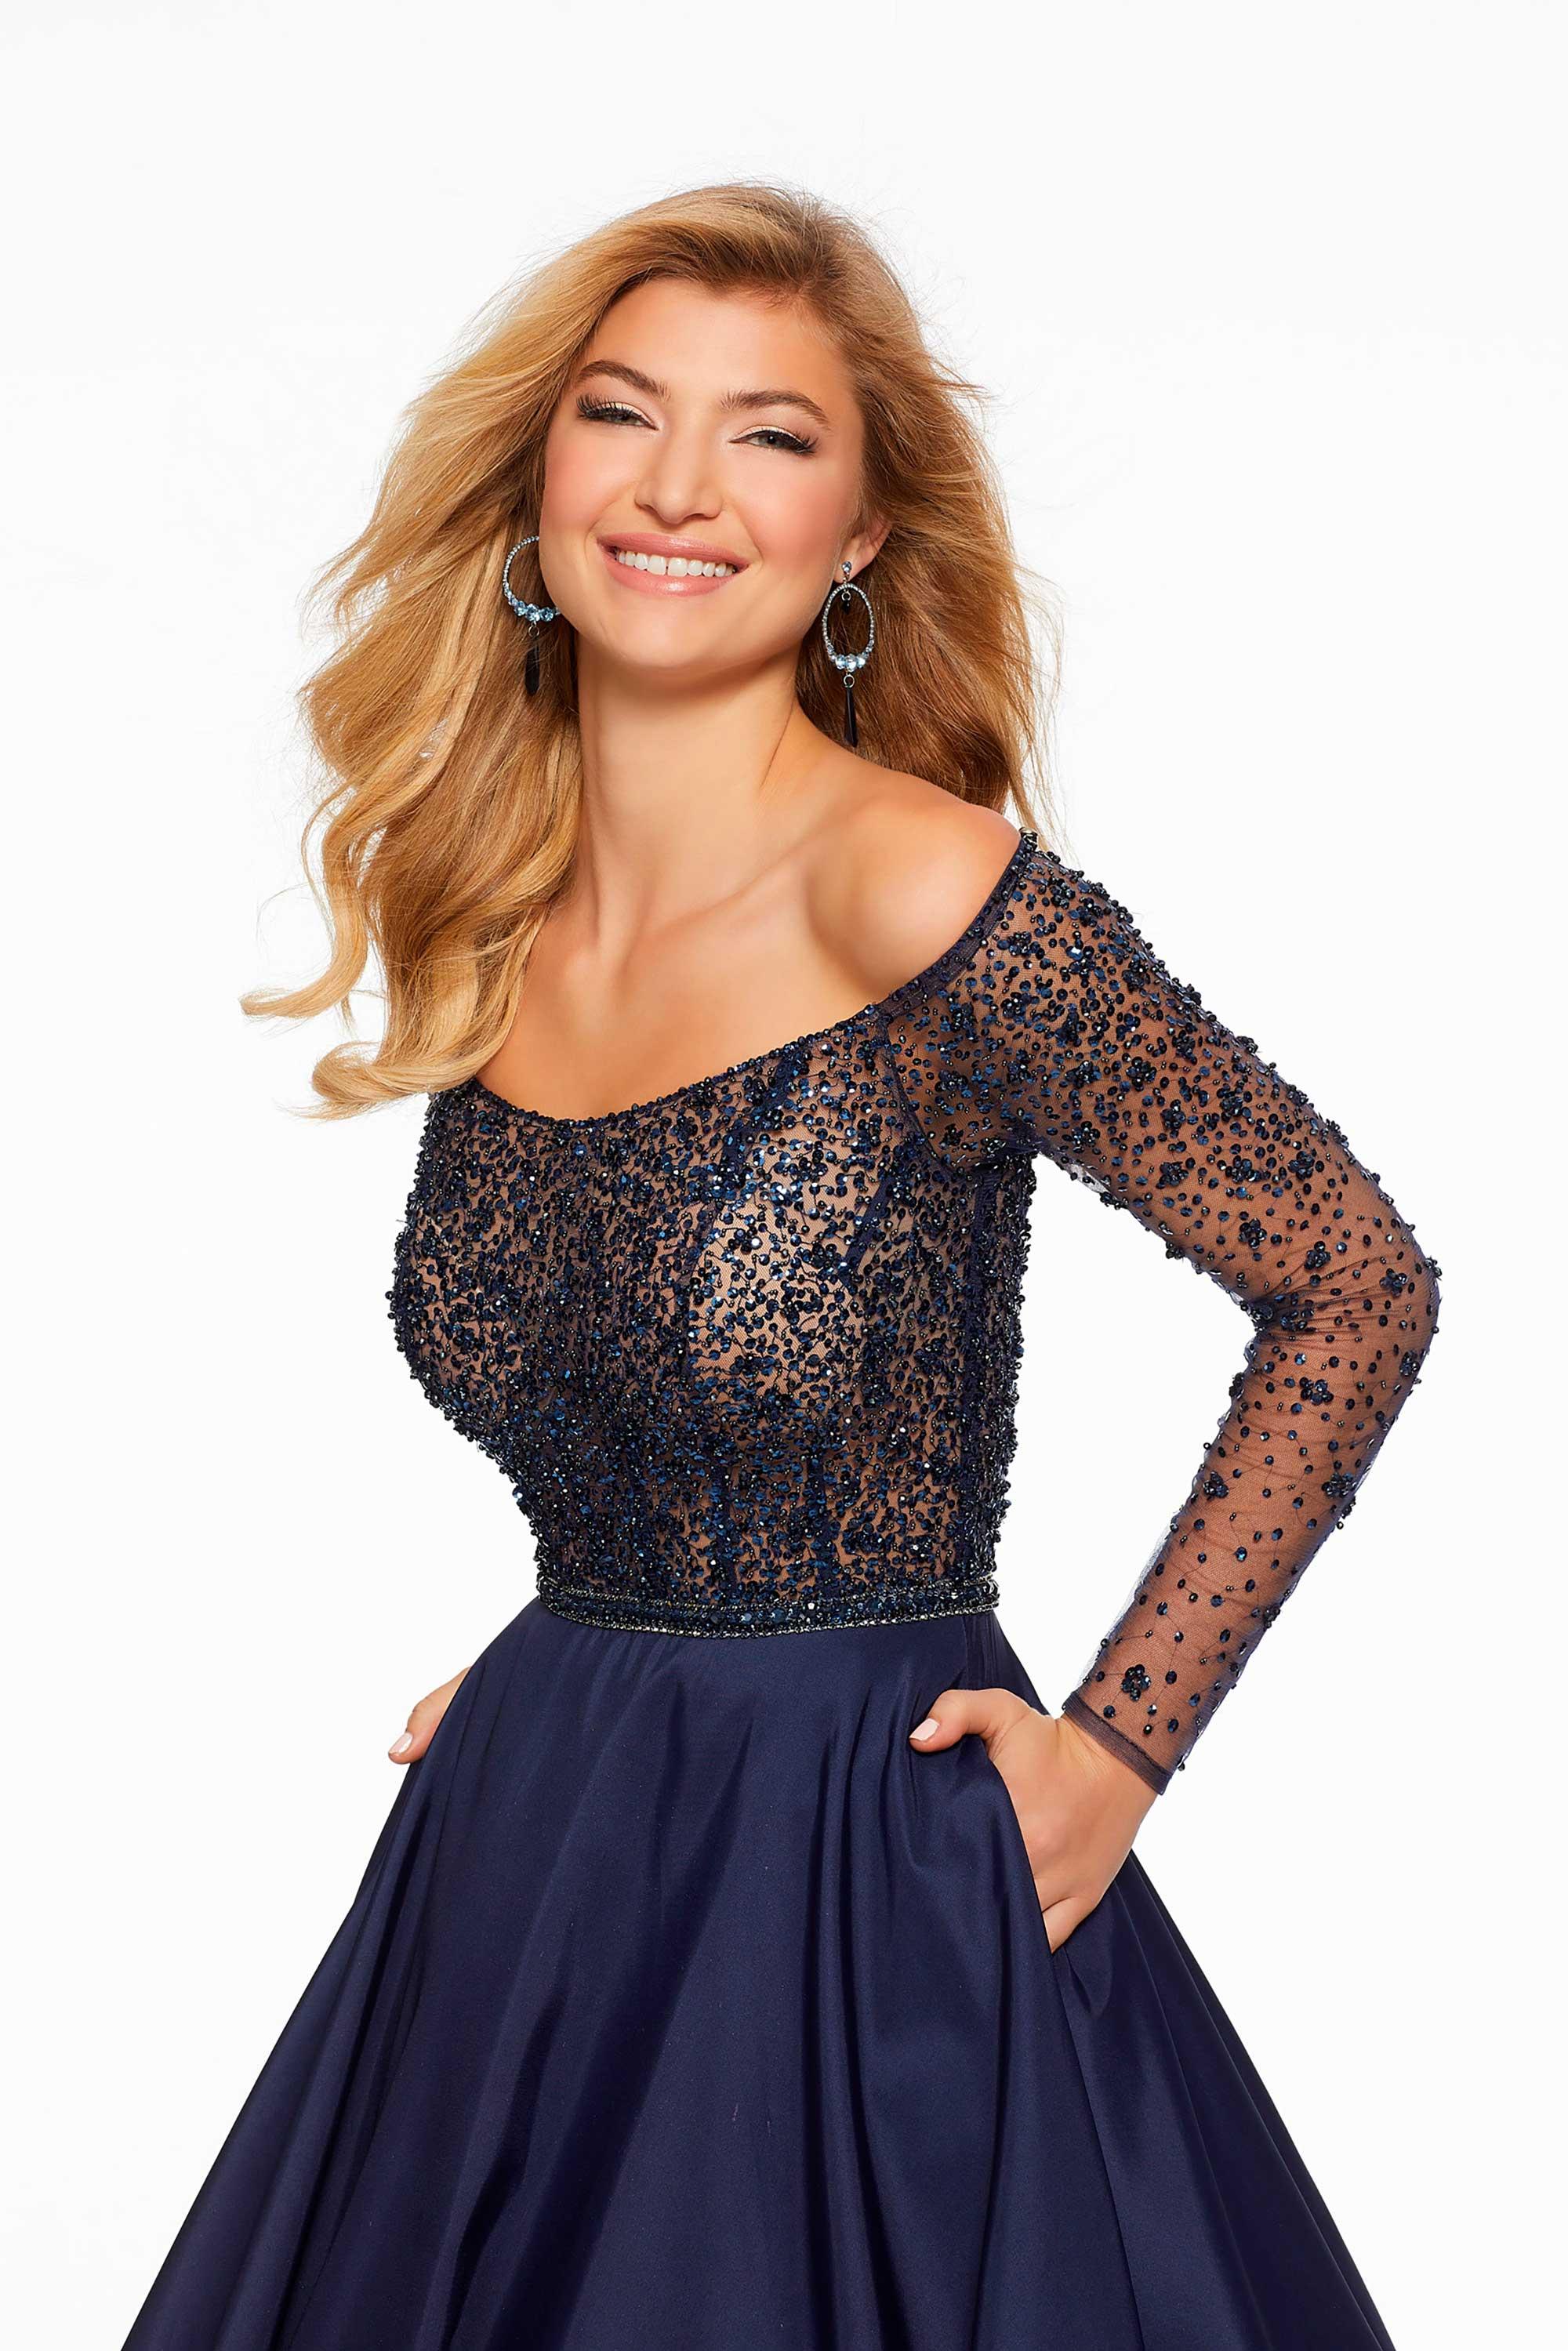 Vestido Lucía Fiesta 2019 mod. 43031 - 5